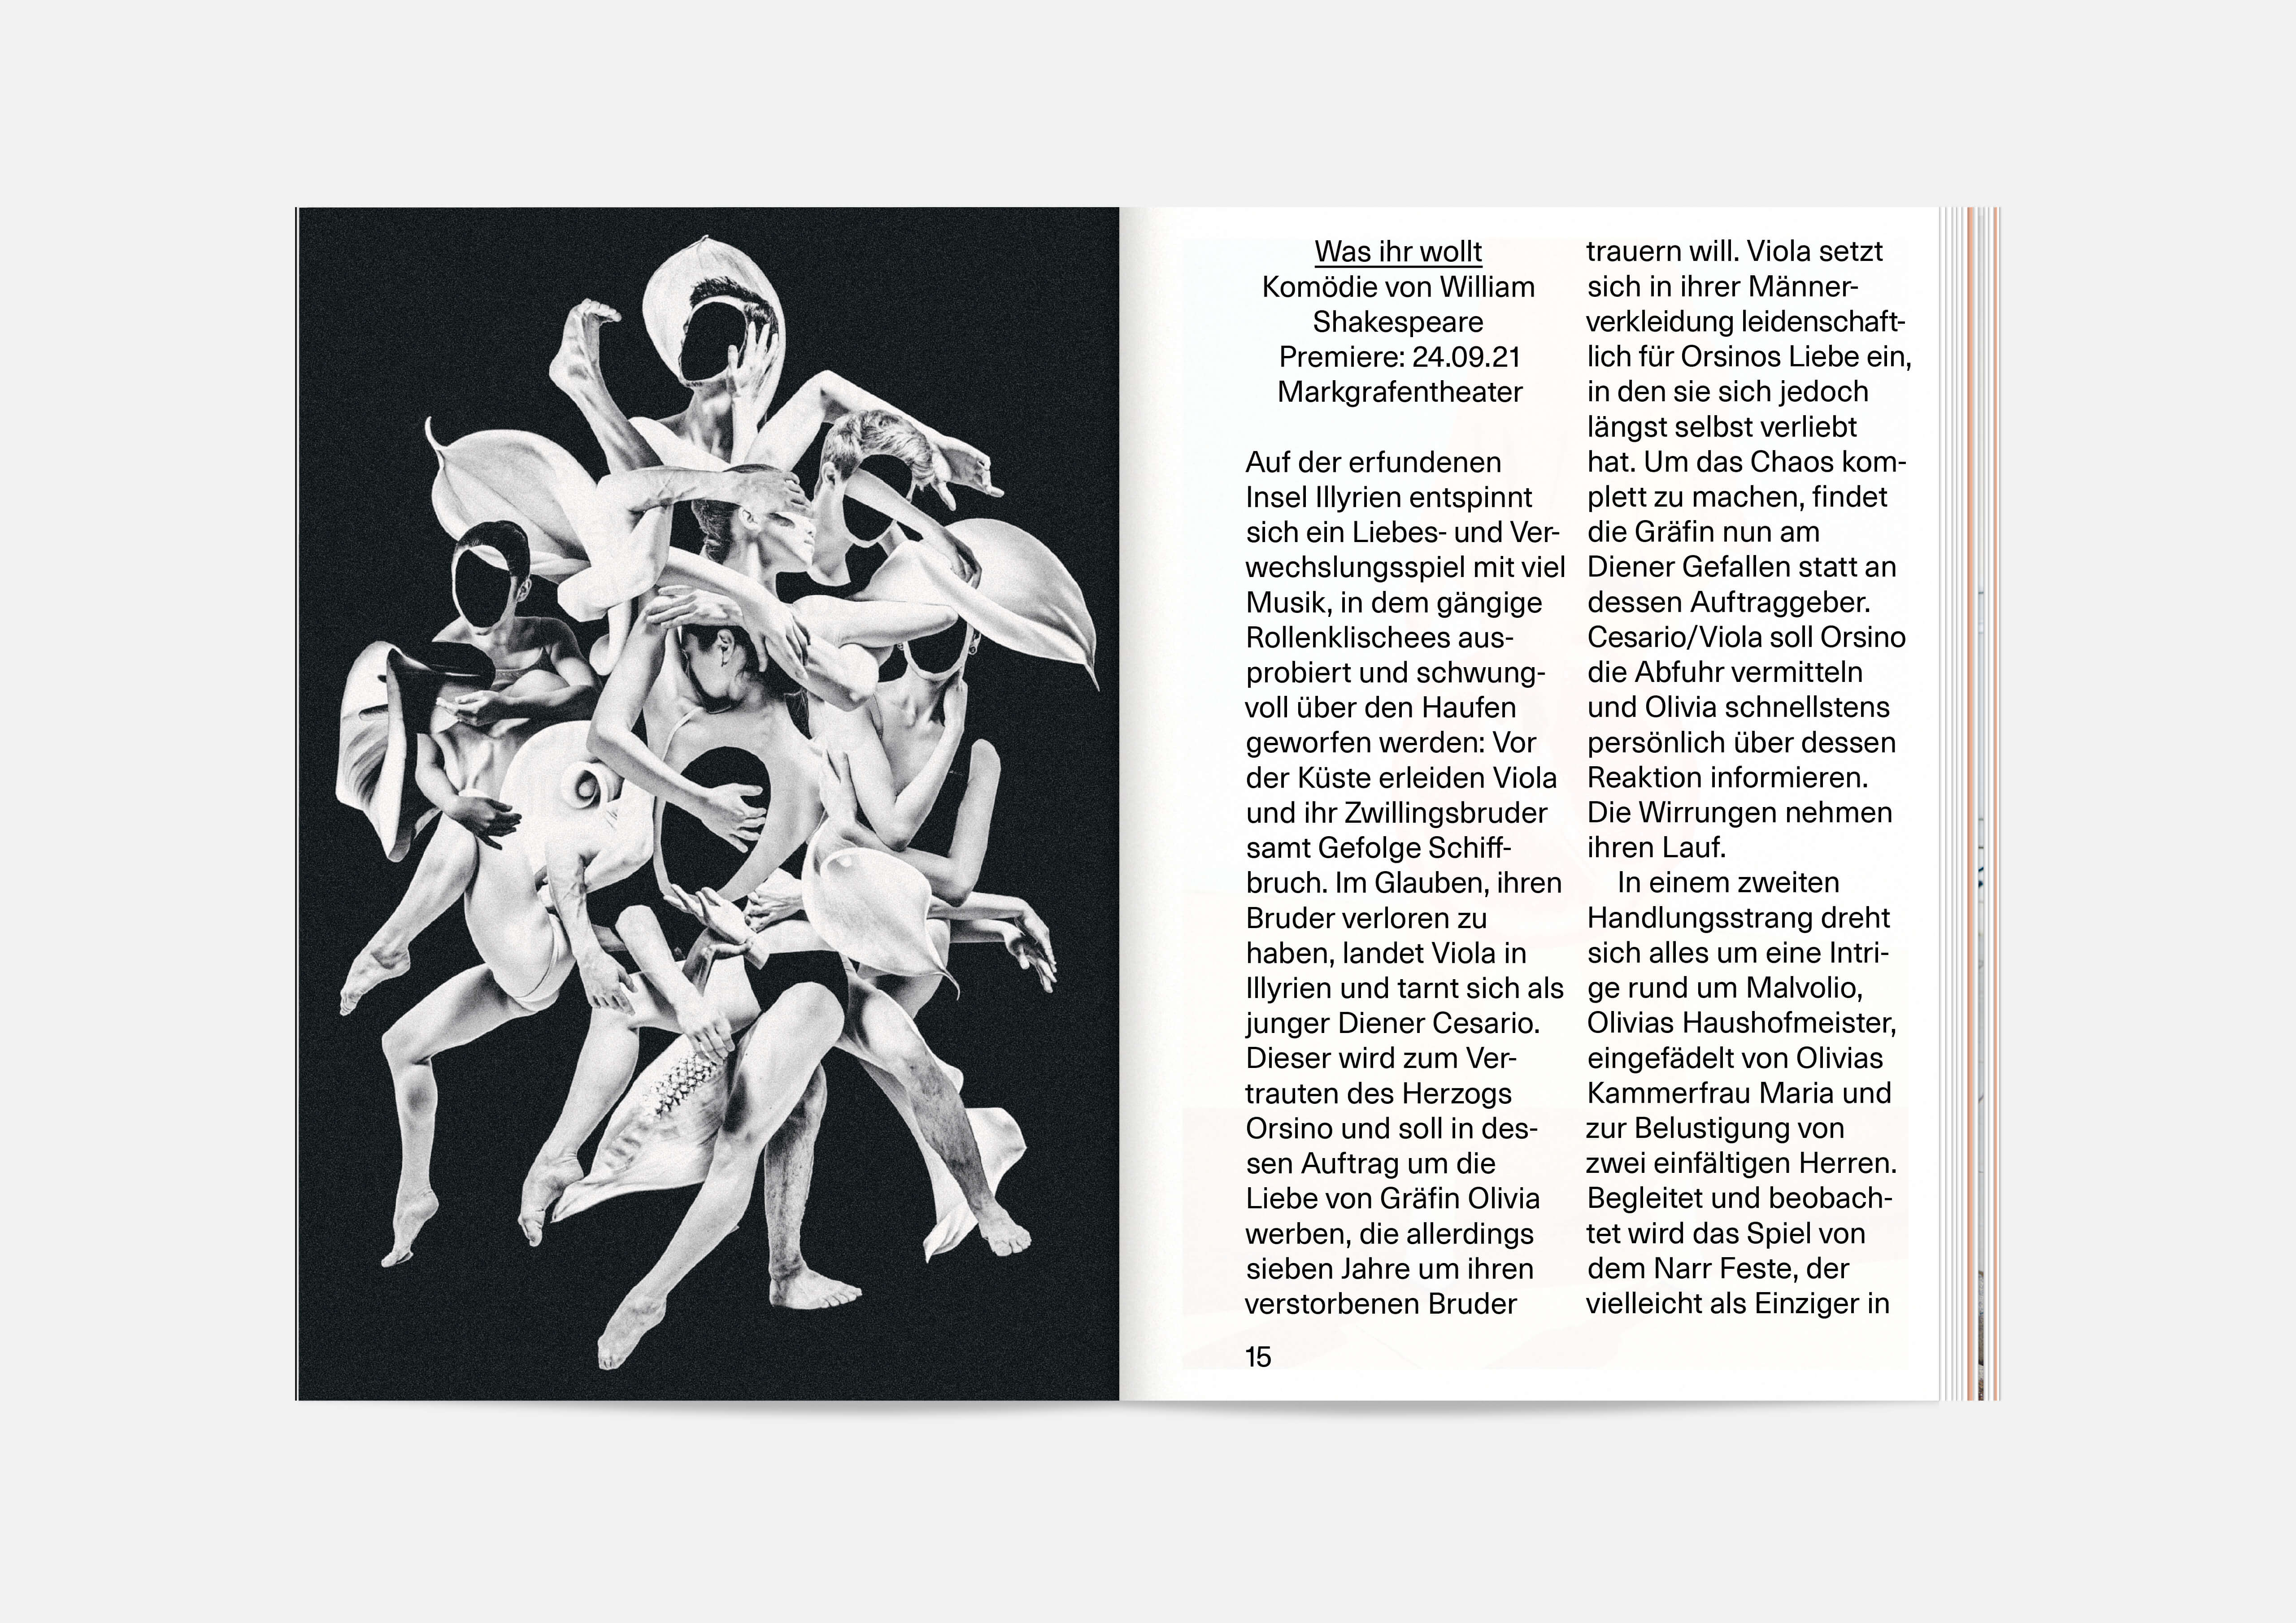 https://neuegestaltung.de/media/pages/clients/theater-erlangen-seasonal-program-2021-22/f93815786b-1630497301/te-szh-202122_04.jpg